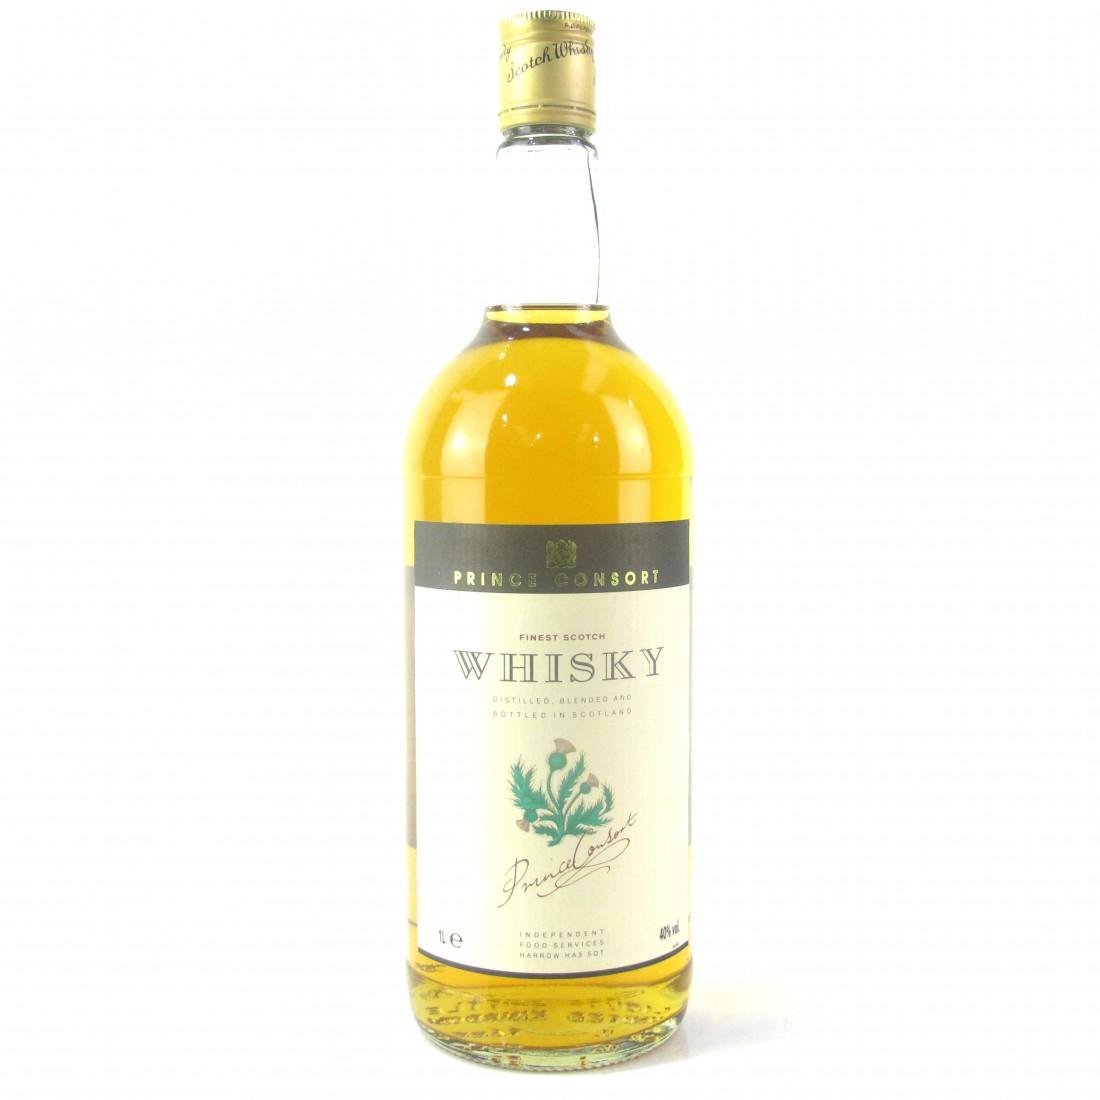 Prince Consort Finest Scotch 1 Litre